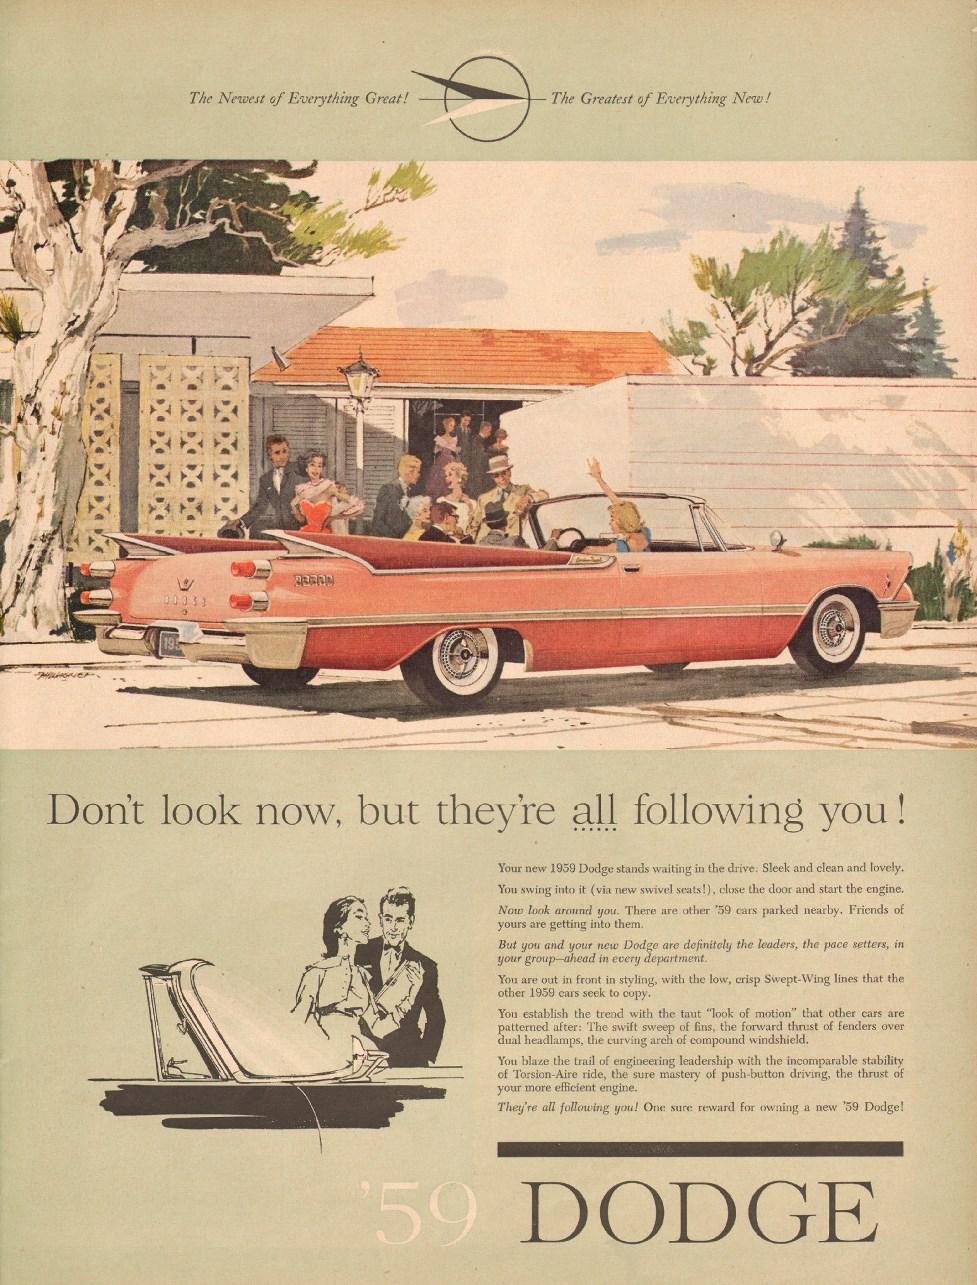 DODGE AUTOMOBILES LIFE 12/08/1958 p. 65